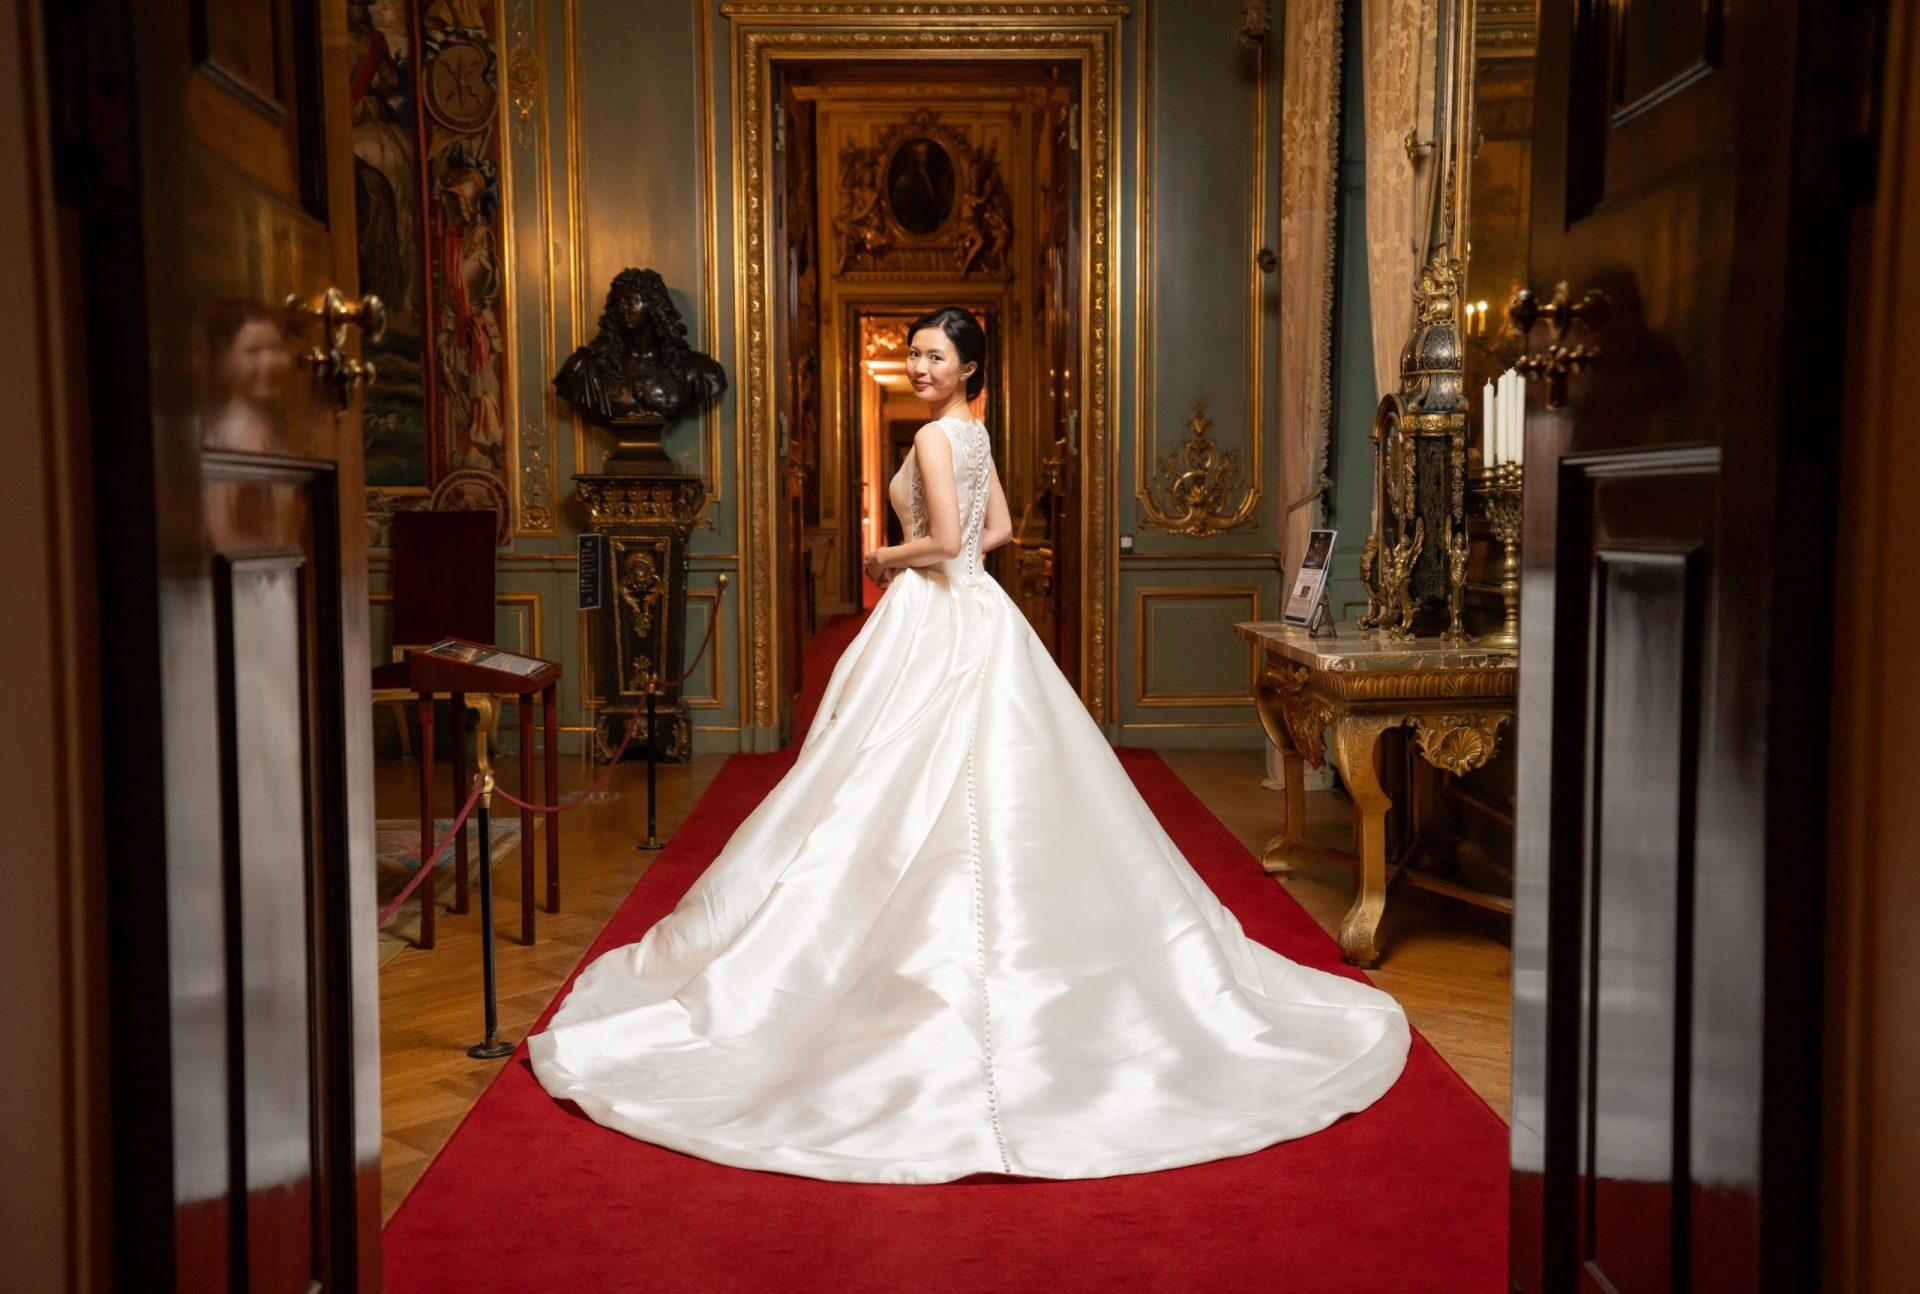 Blenheim Palace Wedding Planner